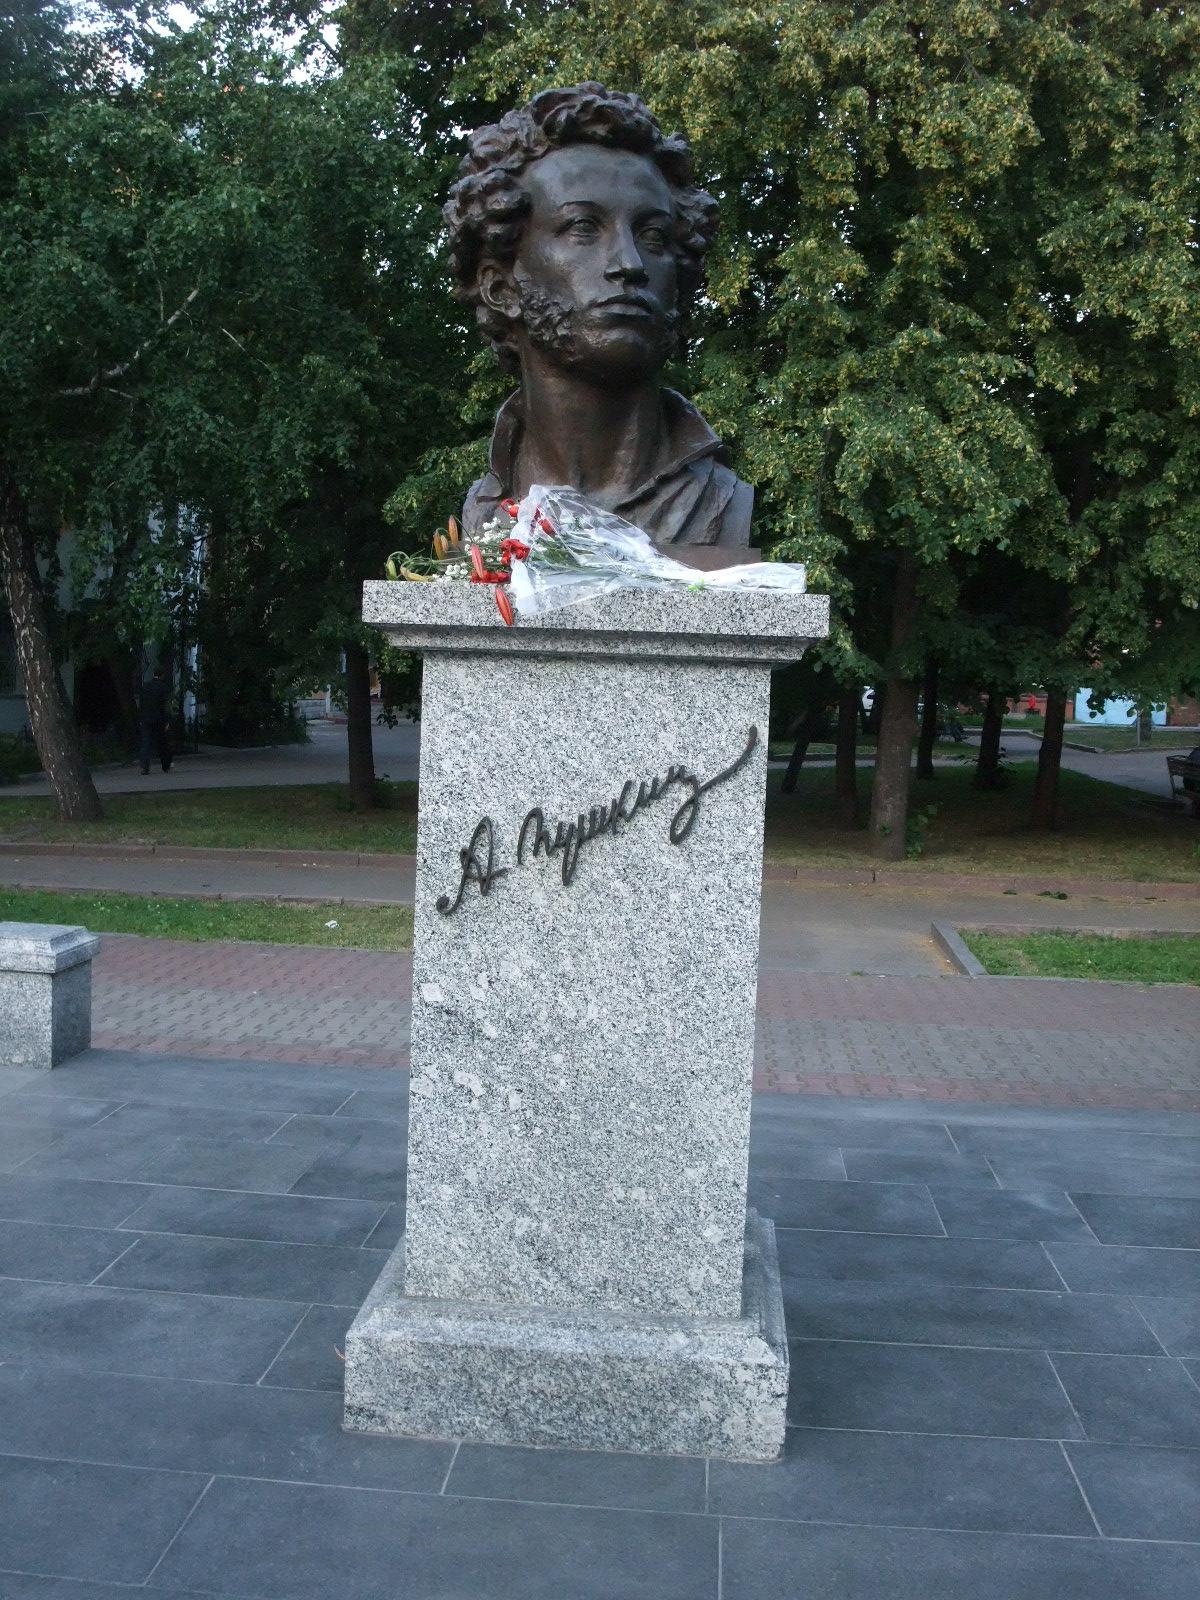 Denne bysten av Pusjkin befinner seg i universitetsbyen Tomsk, Sibir, Russland.